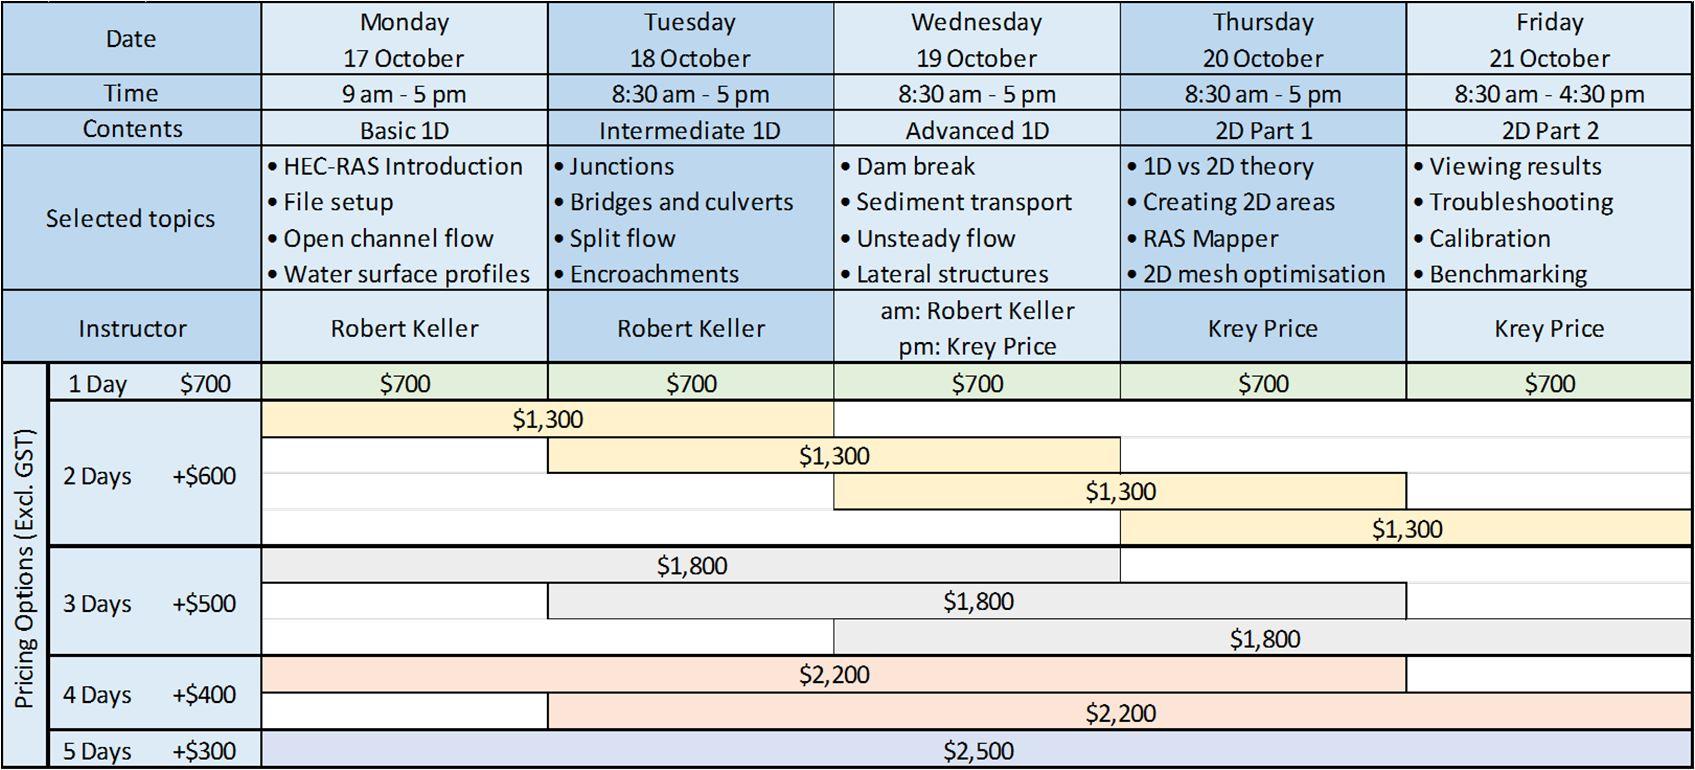 melbourne-schedule